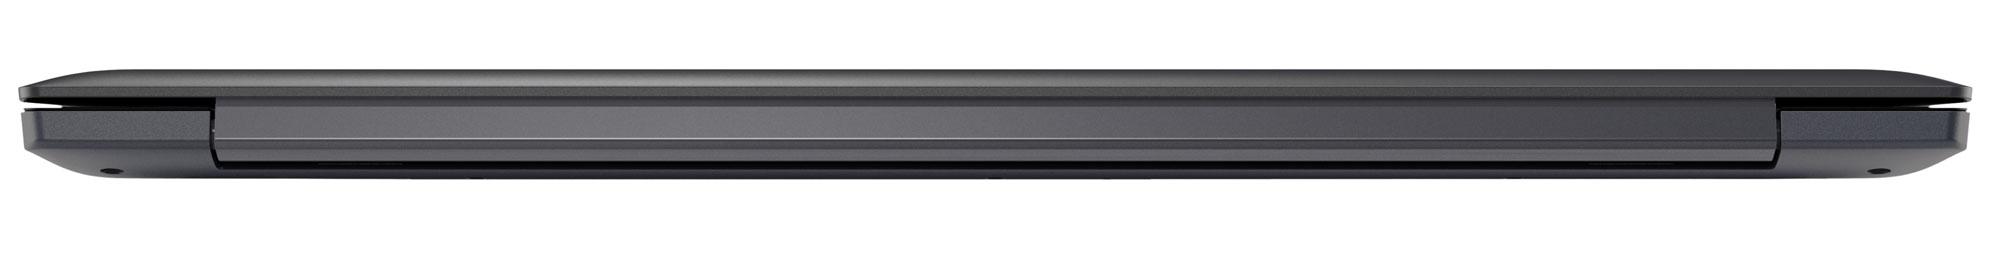 Фото  Ноутбук Lenovo V320-17IKB Iron Grey (81AH0064RA)